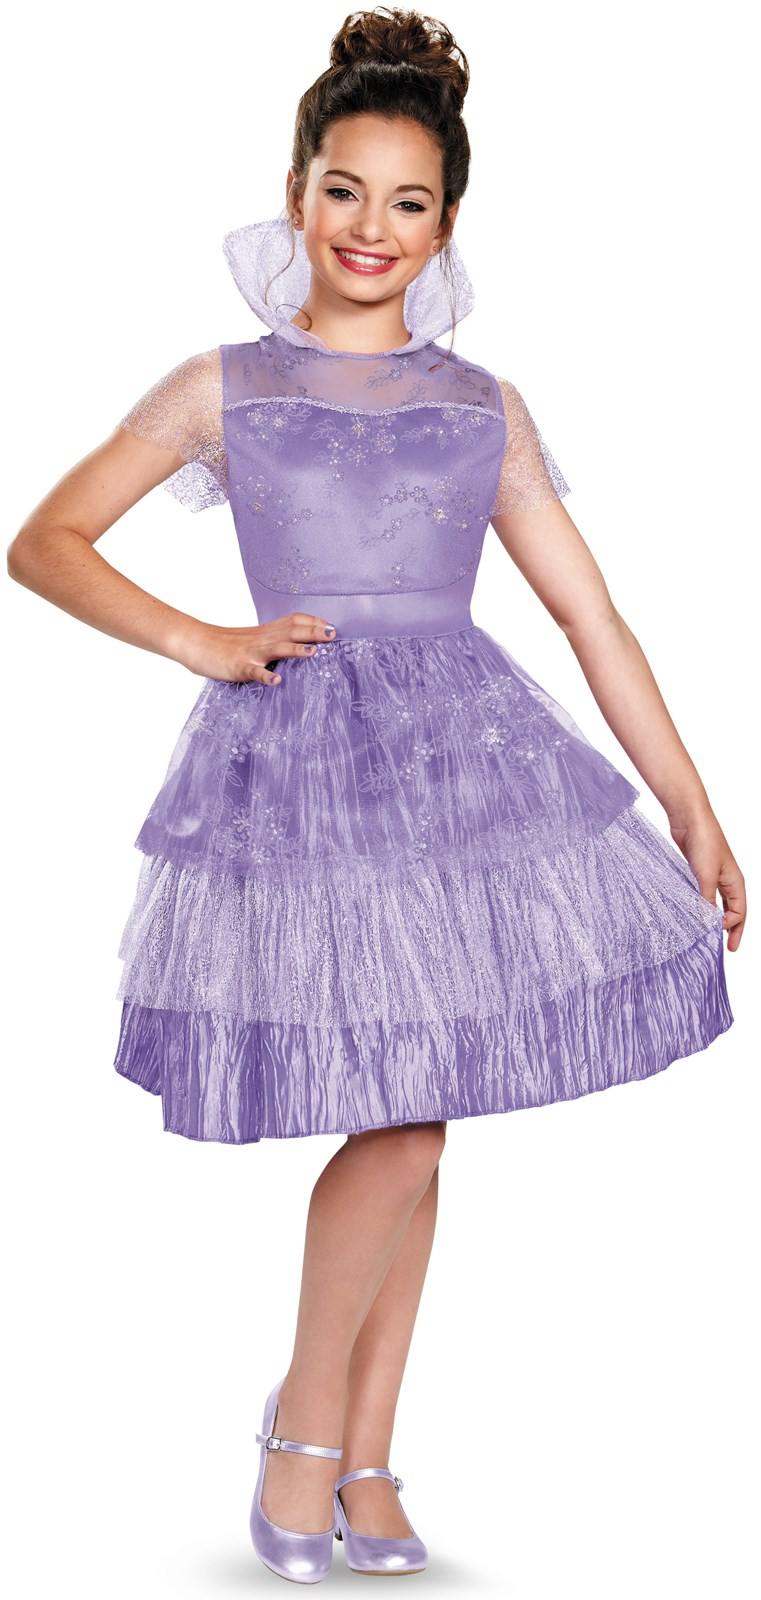 Disneys Descendants: Girls Deluxe Mal Coronation Costume